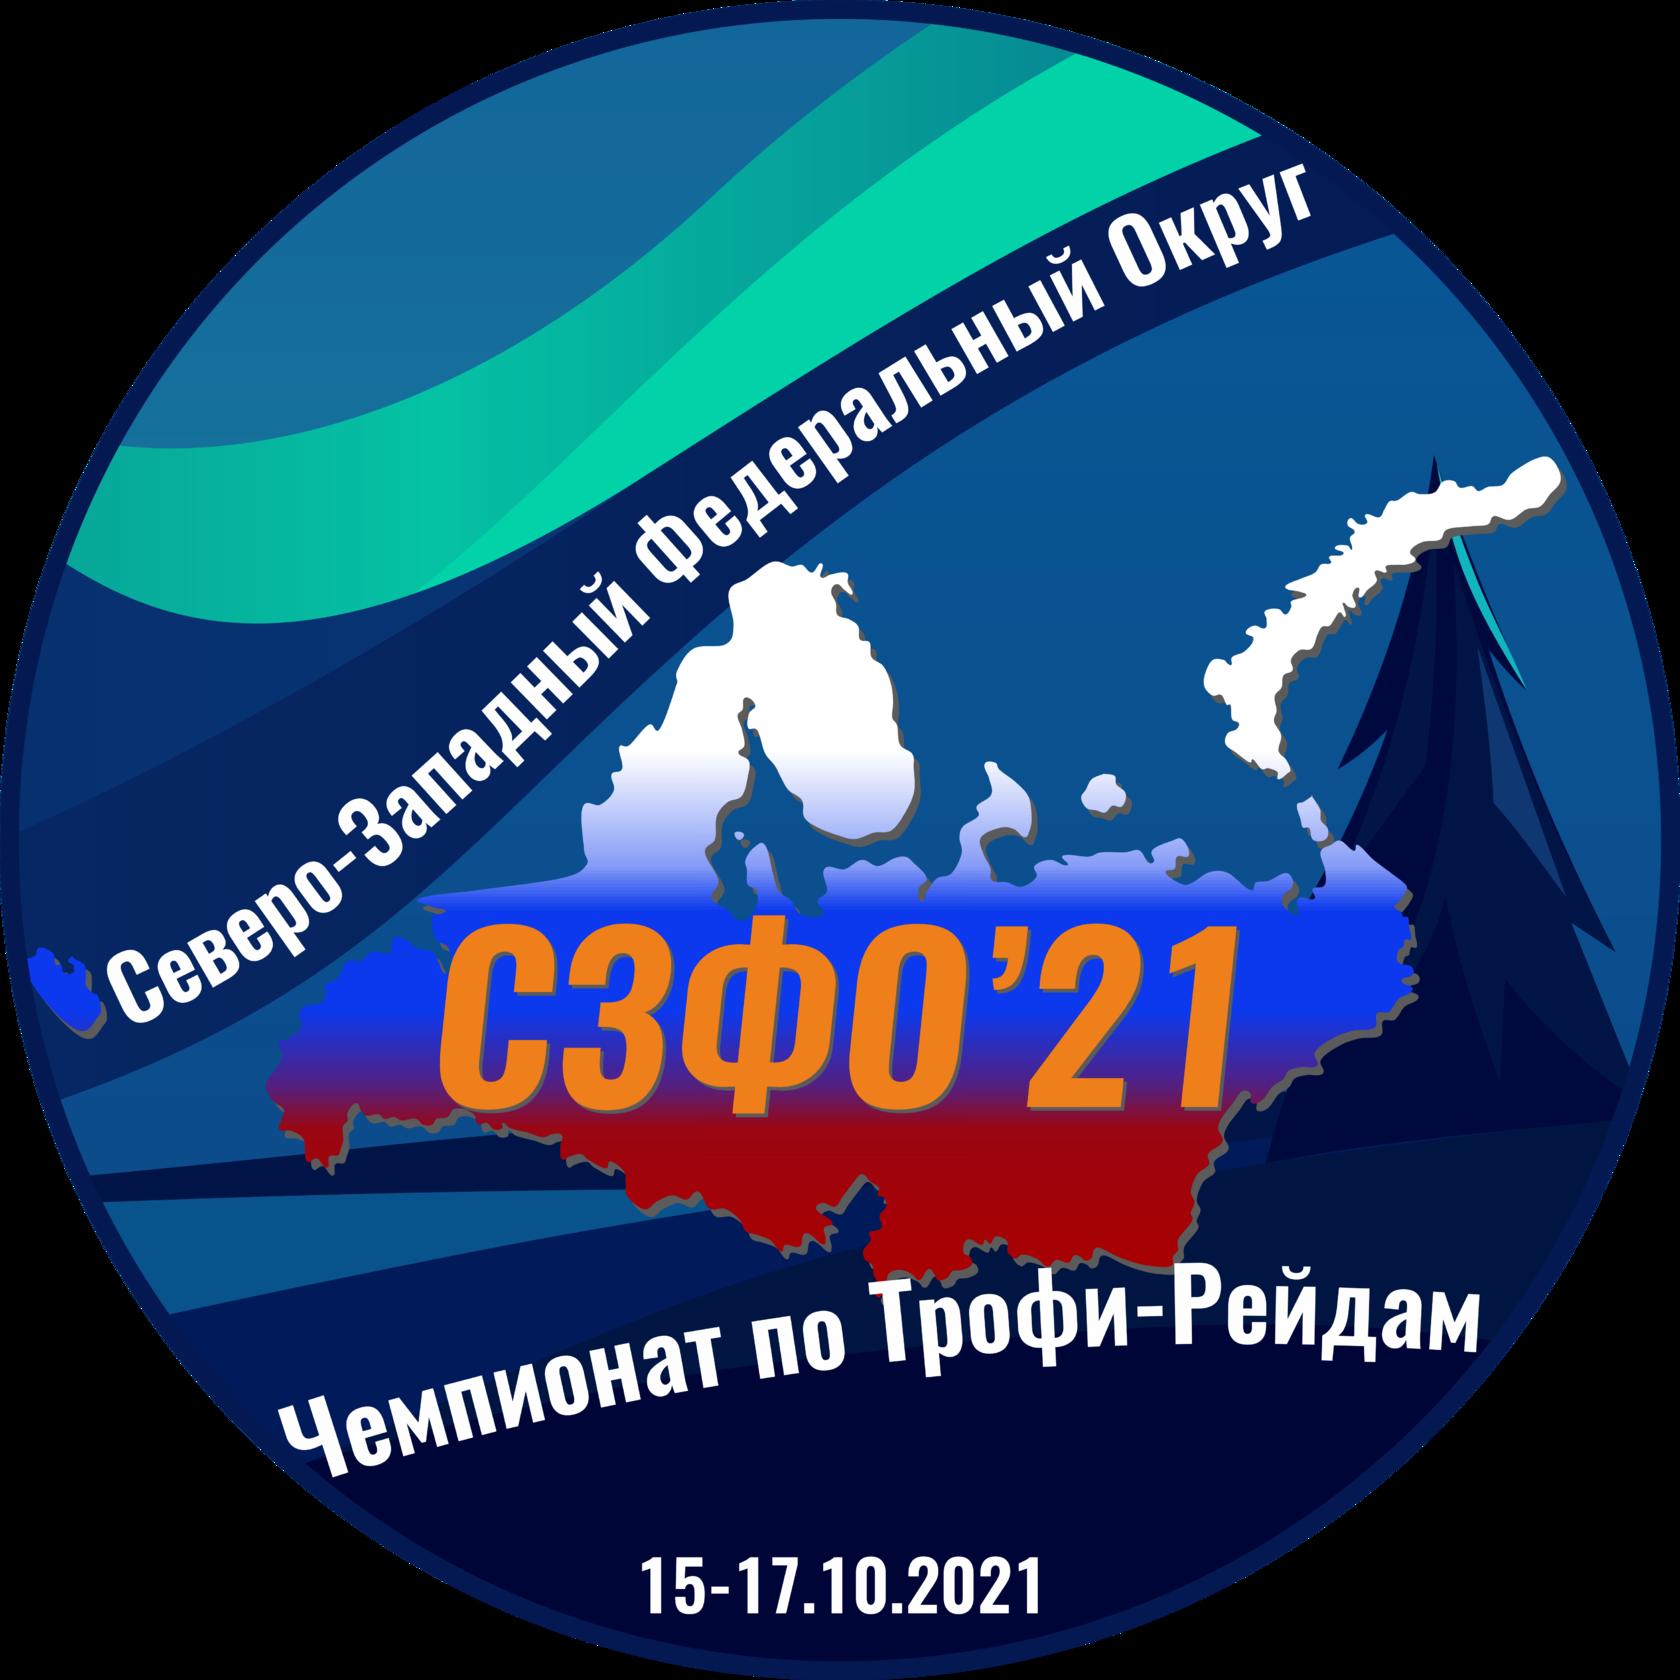 Чемпионат СЗФО'21